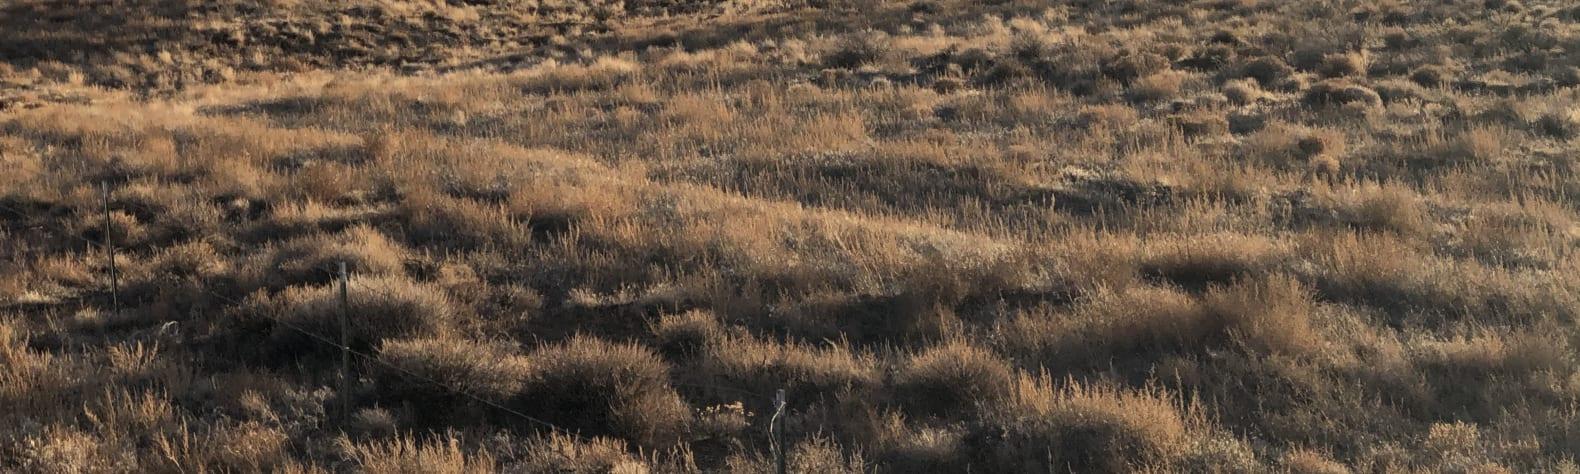 The Bullock Ranch